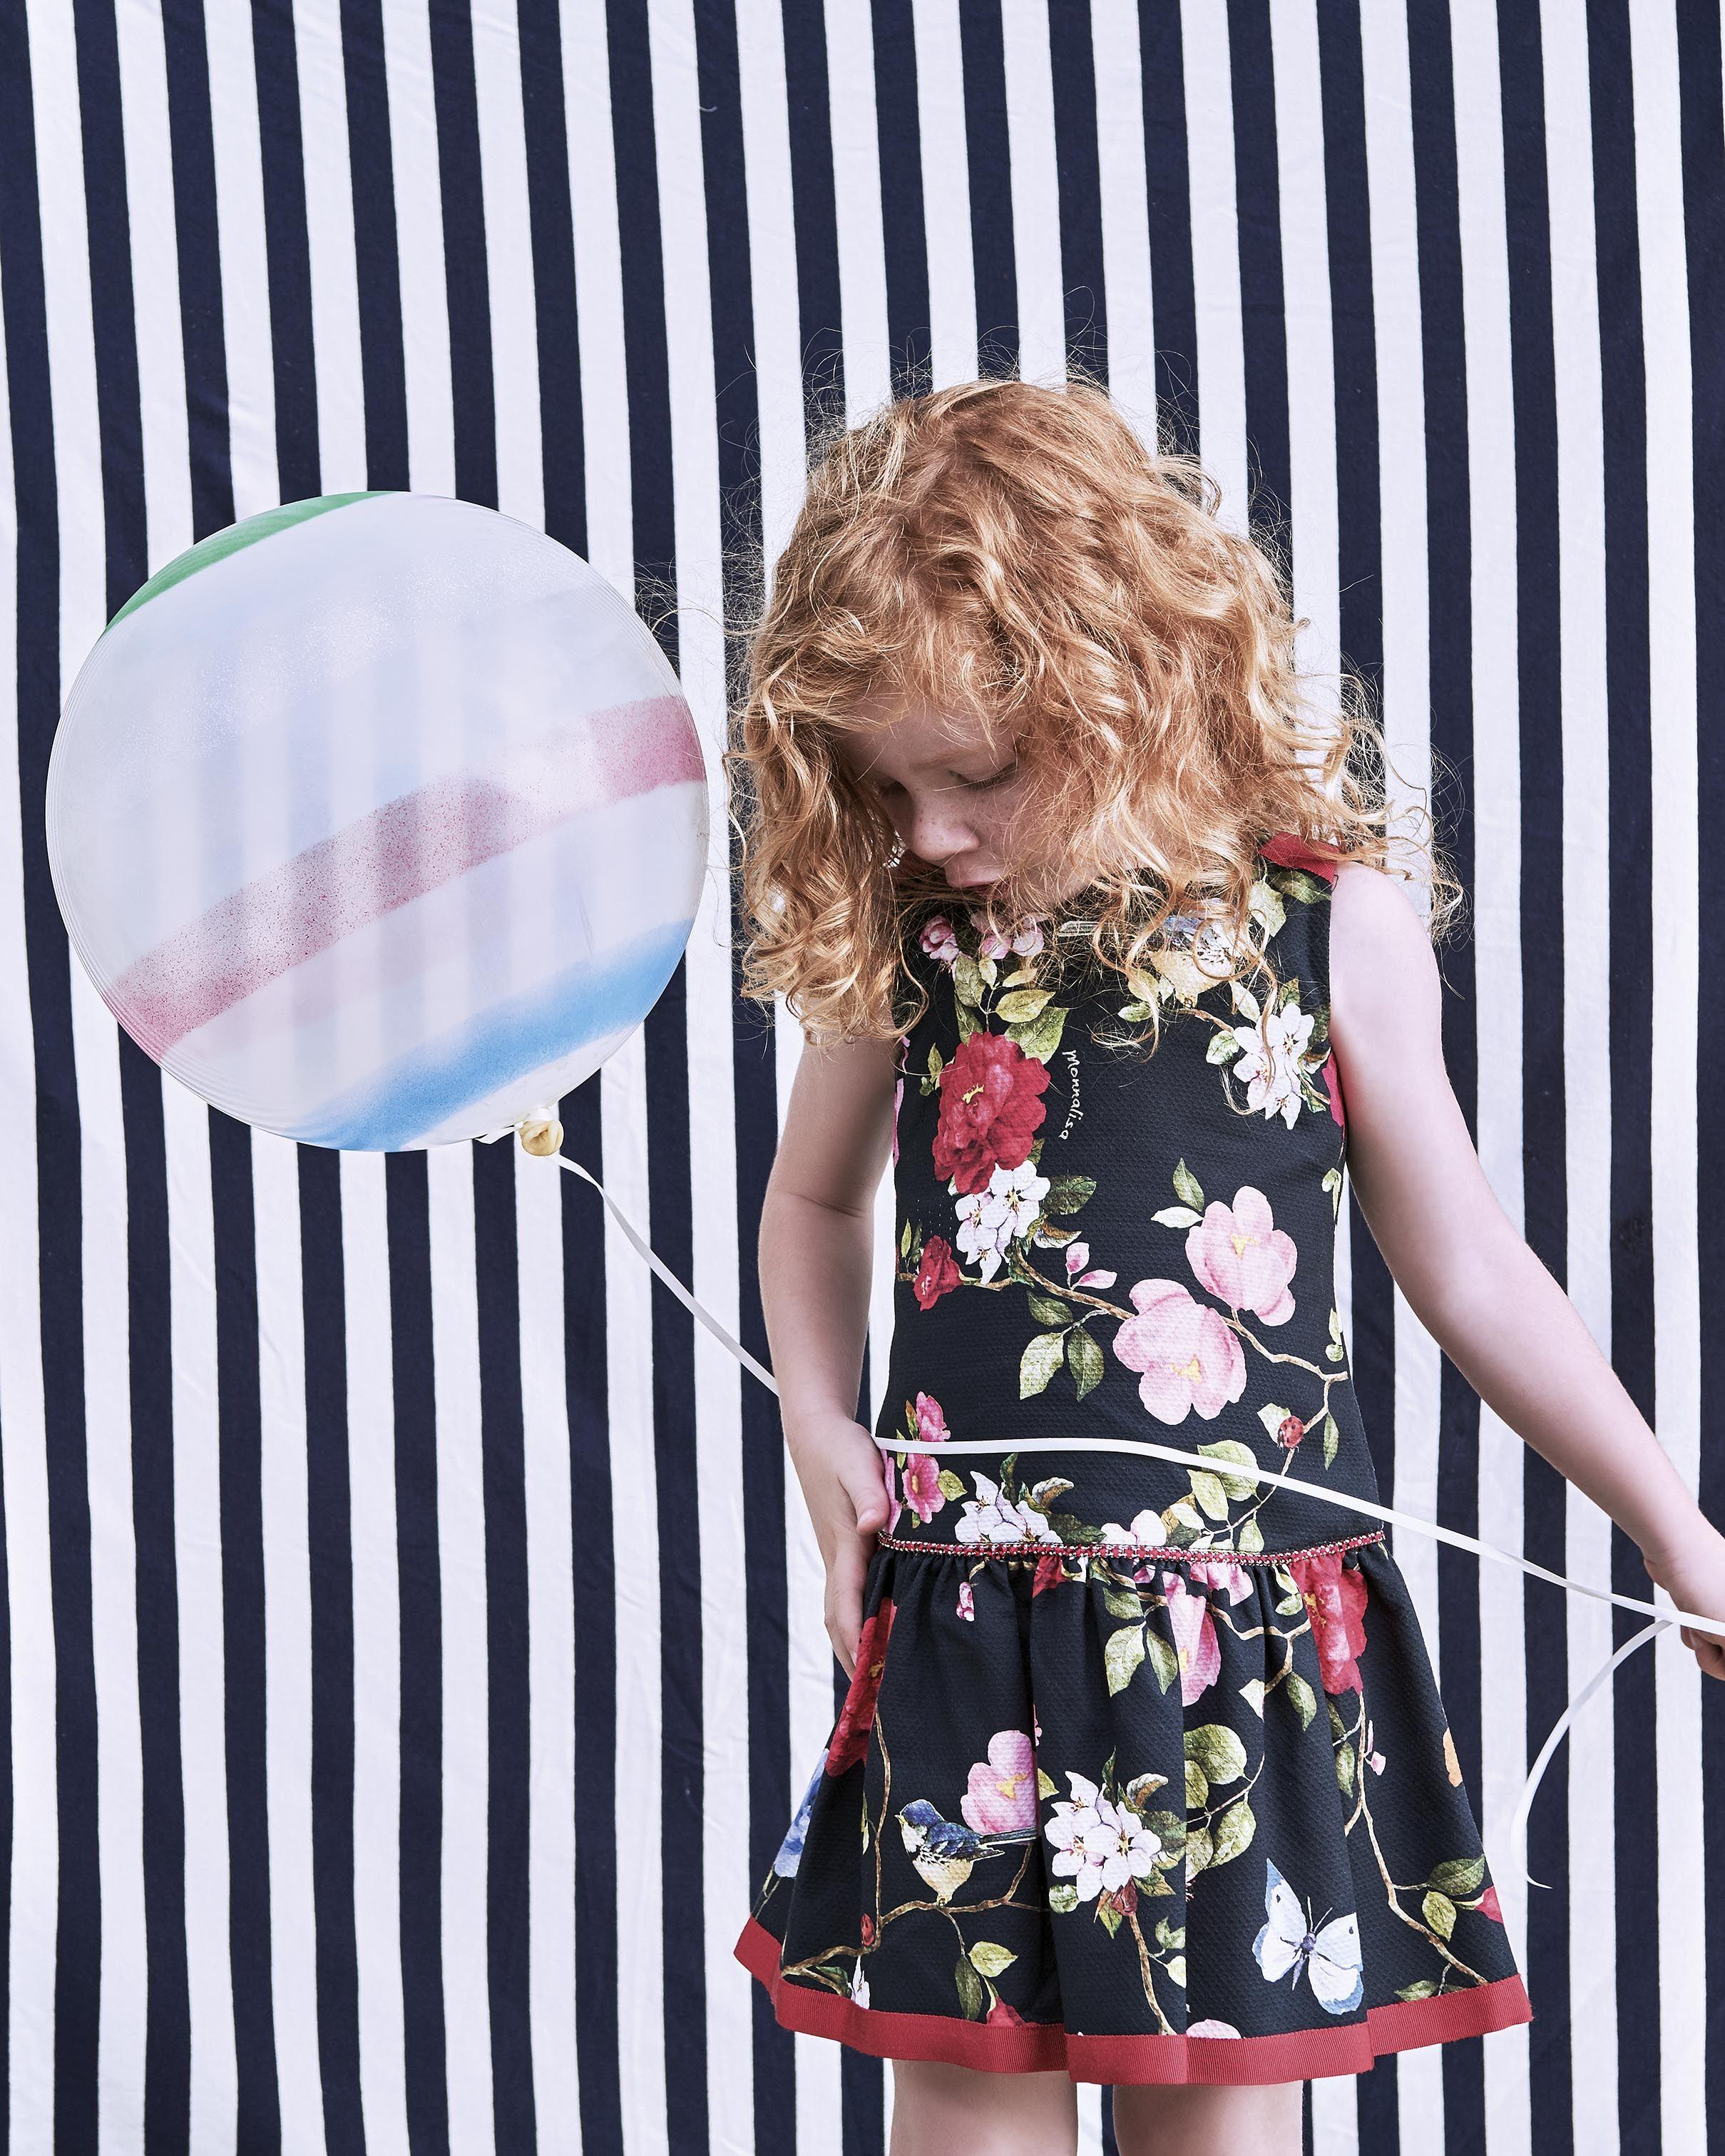 c93db2a81 MONNALISA Spring Summer 2017 #Monnalisa #fashion #kids #childrenswear  #newcollection #girl #style #summer #balloon #flowery #red #blue #flower  #garden ...